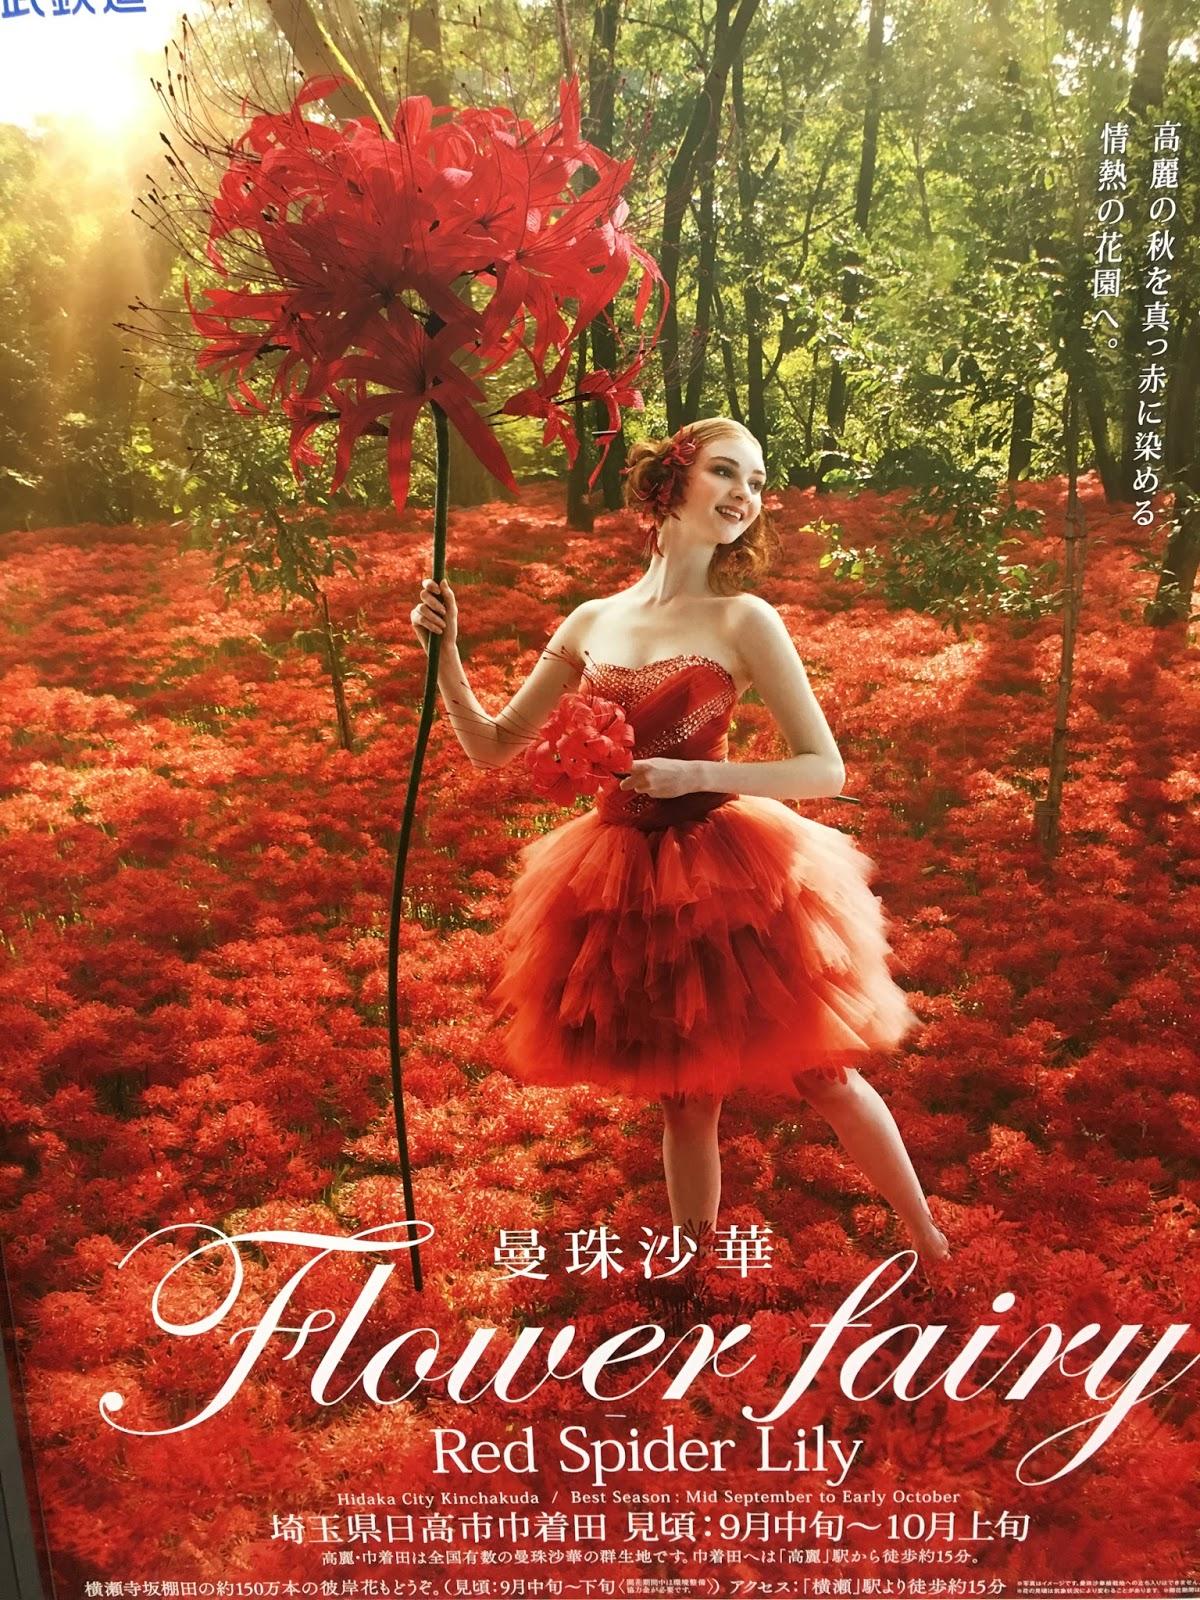 Red spider lily higanbana a symbol of autumnd death izmirmasajfo